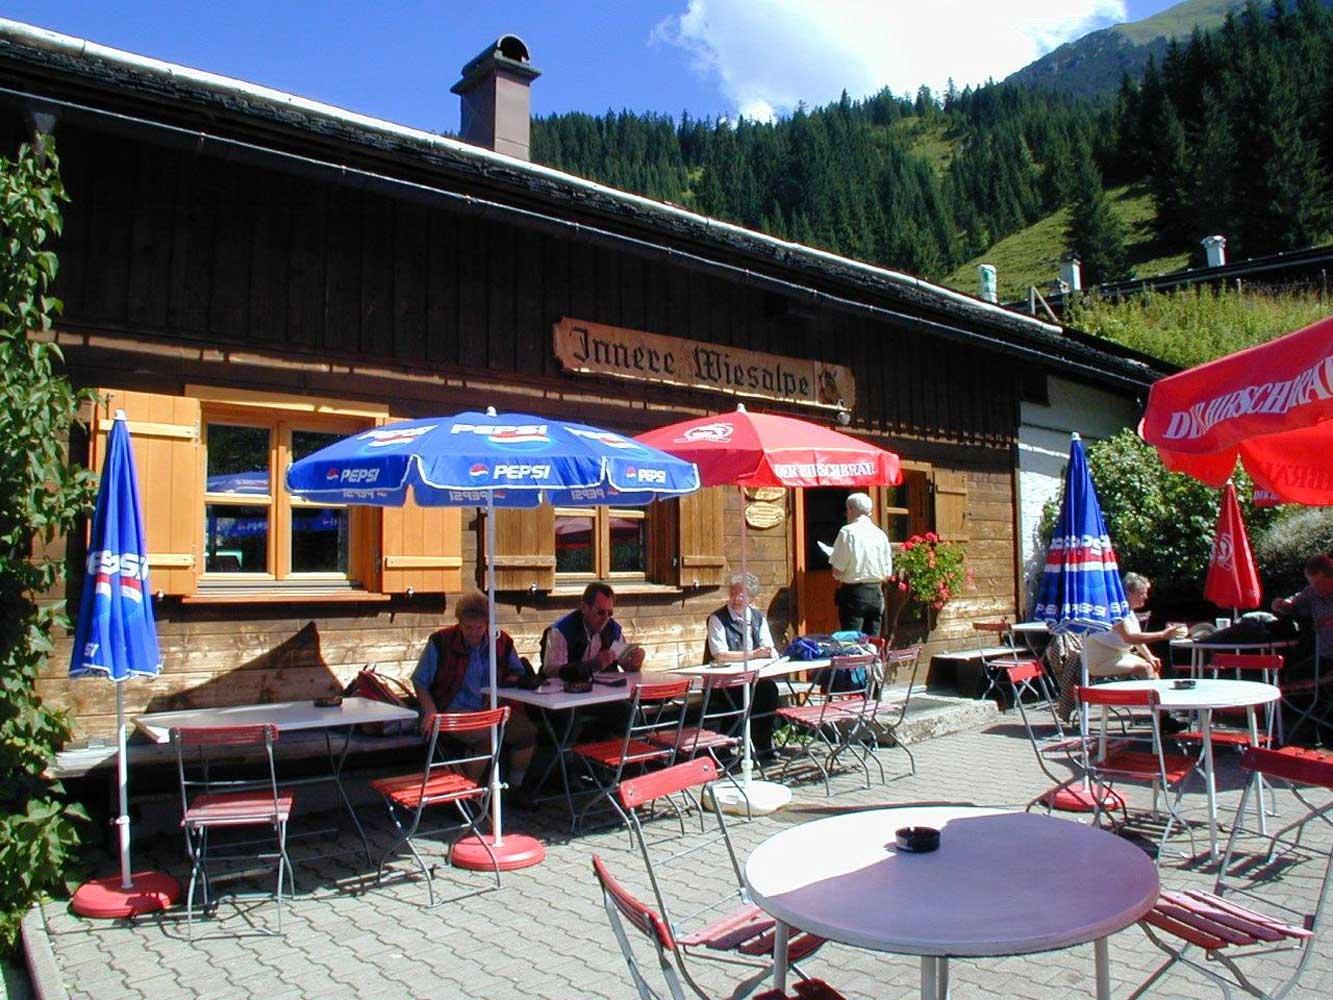 Innere Wiesalpe Kleinwalsertal, Ausflugsziel, Alpe, Brotzeit – Sommerfeeling